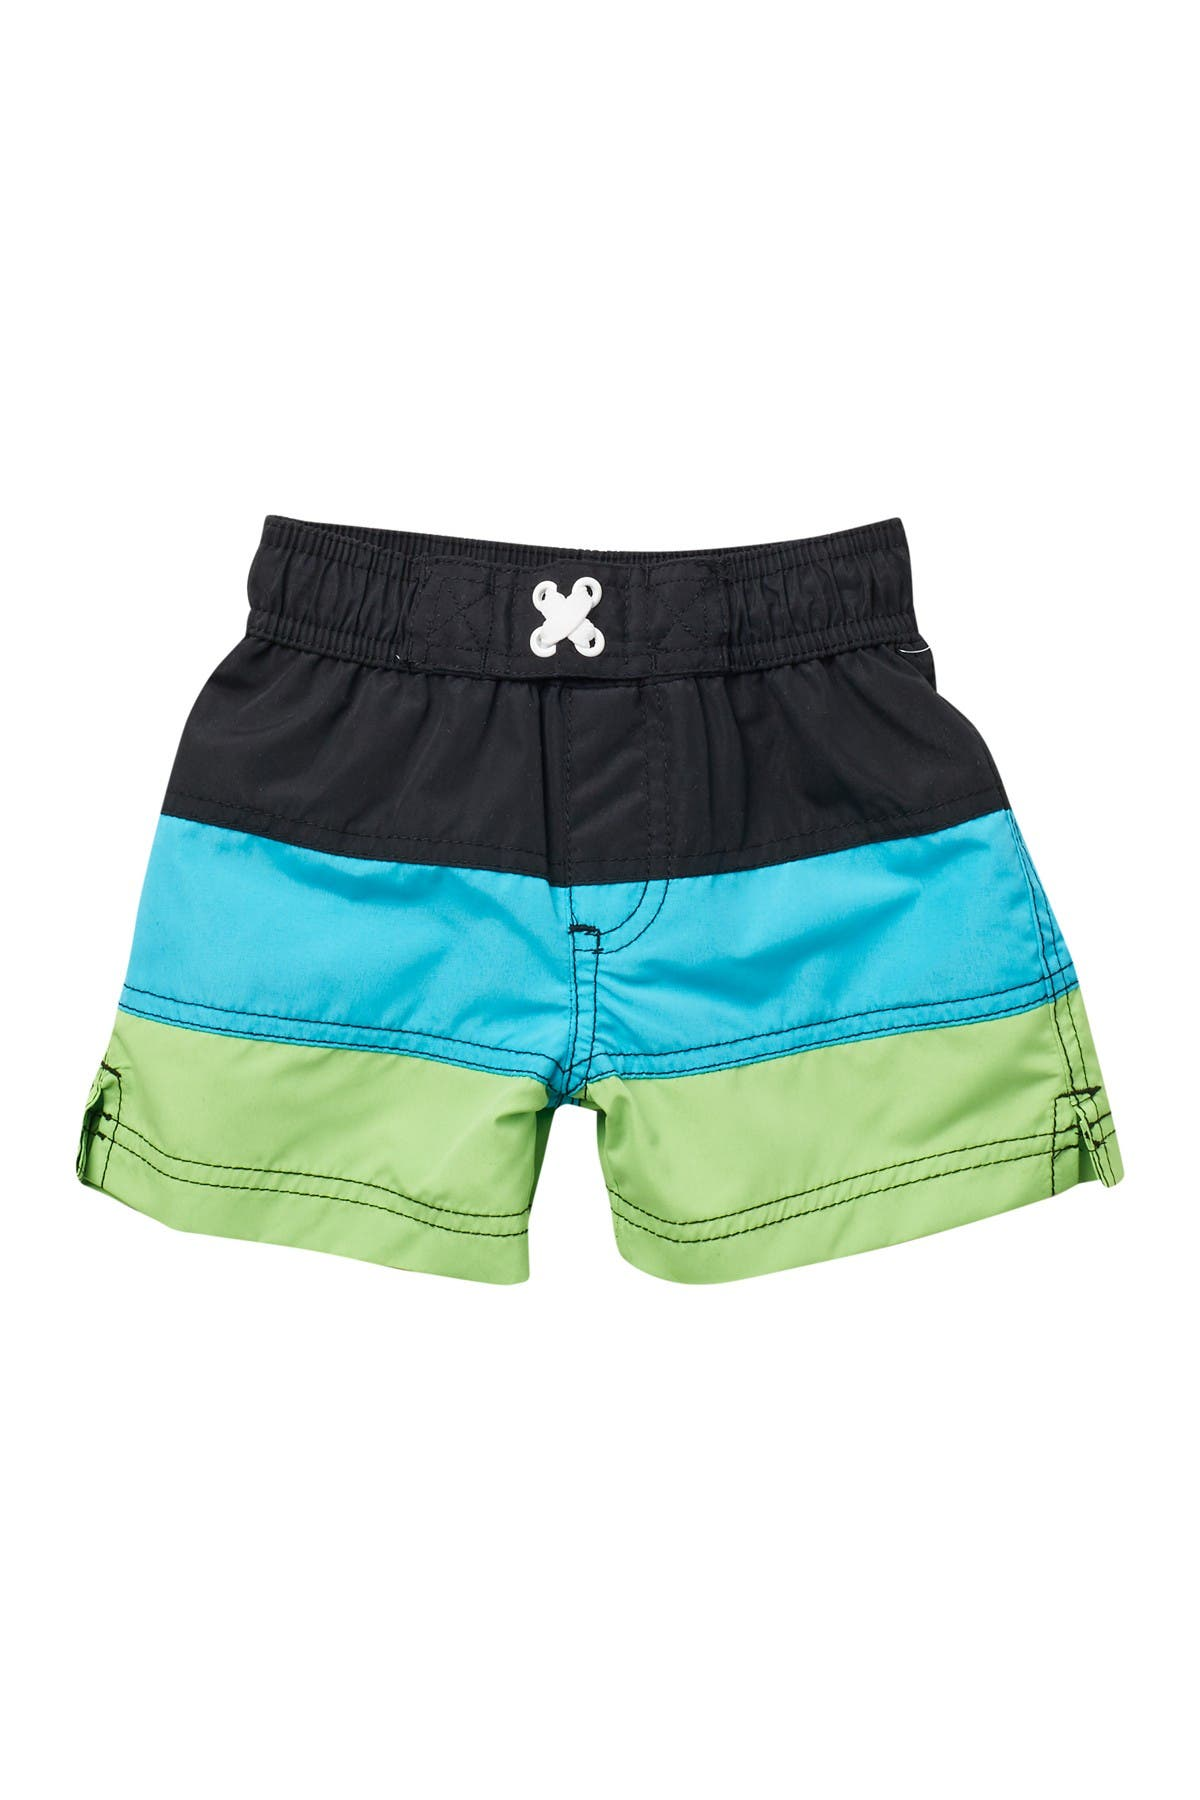 Image of iXtreme Color Block Swim Trunks